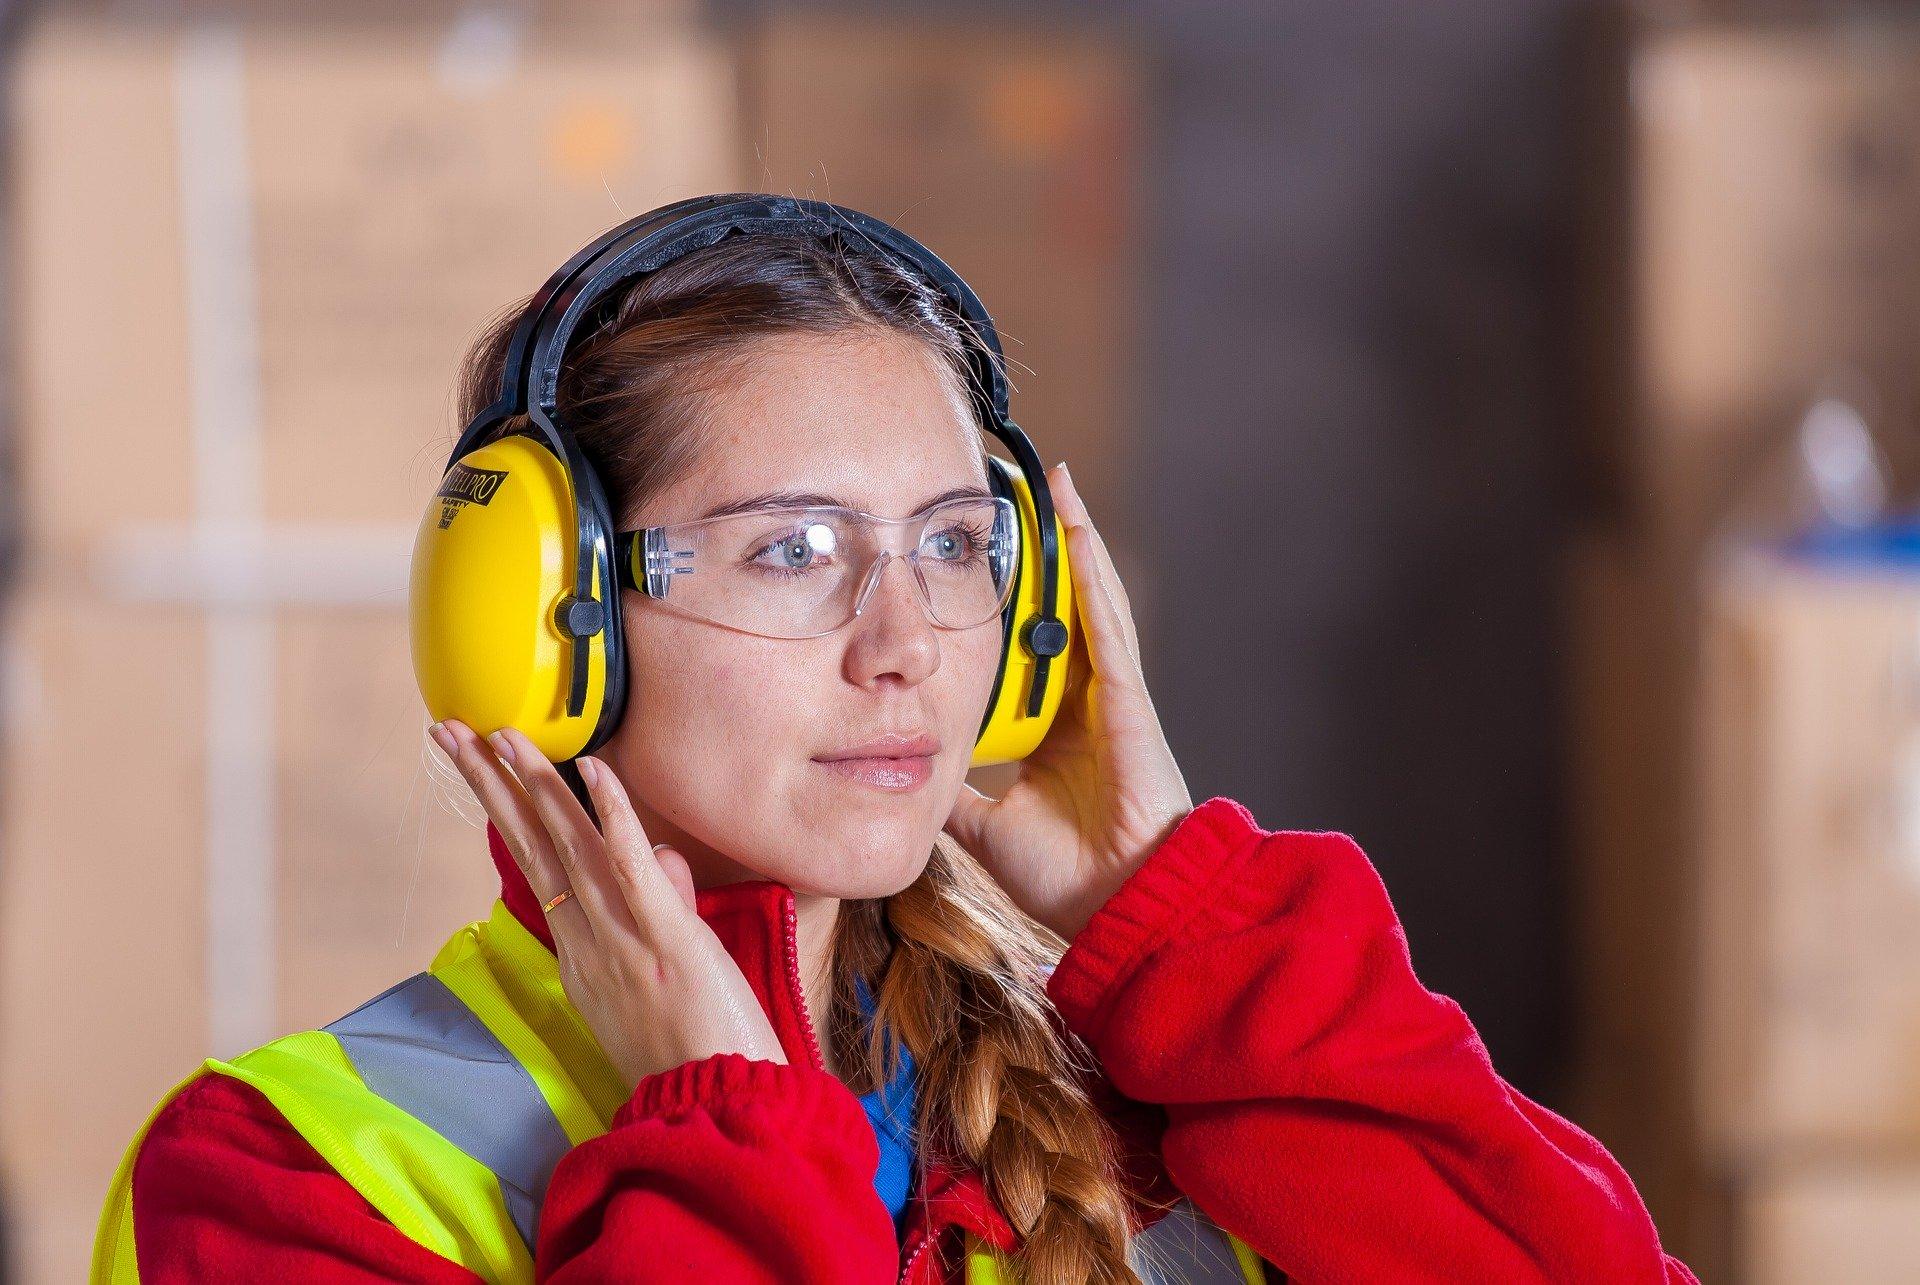 Safety & Security / Охрана труда и безопасность